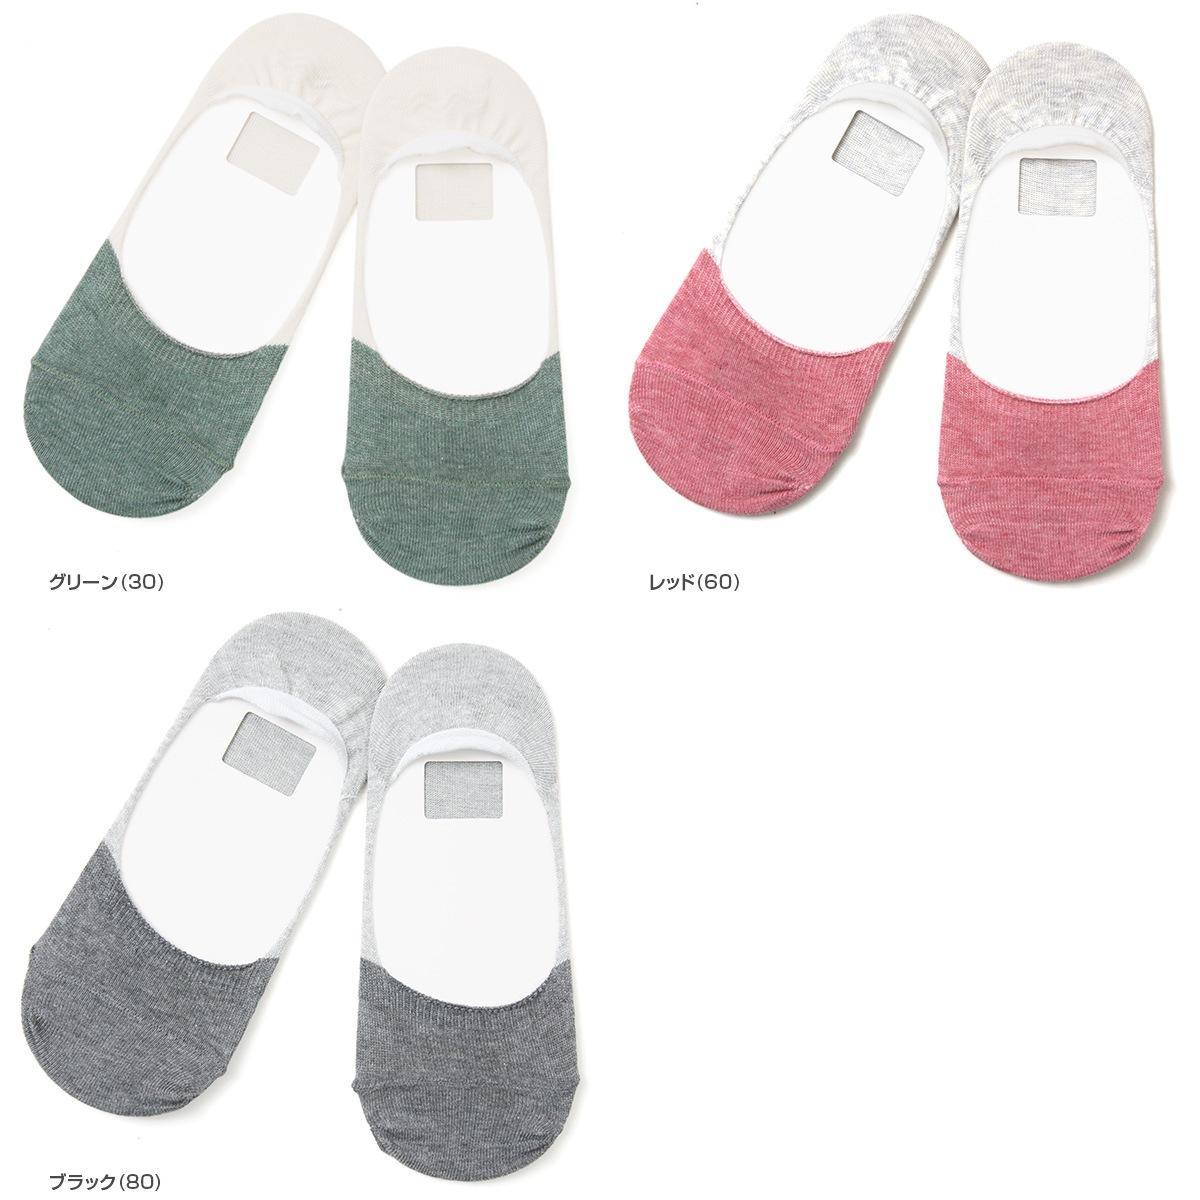 ANONYMOUSEISM アノニマスイズム OC2トーンインタクトローファーインソックス 靴下 15152400